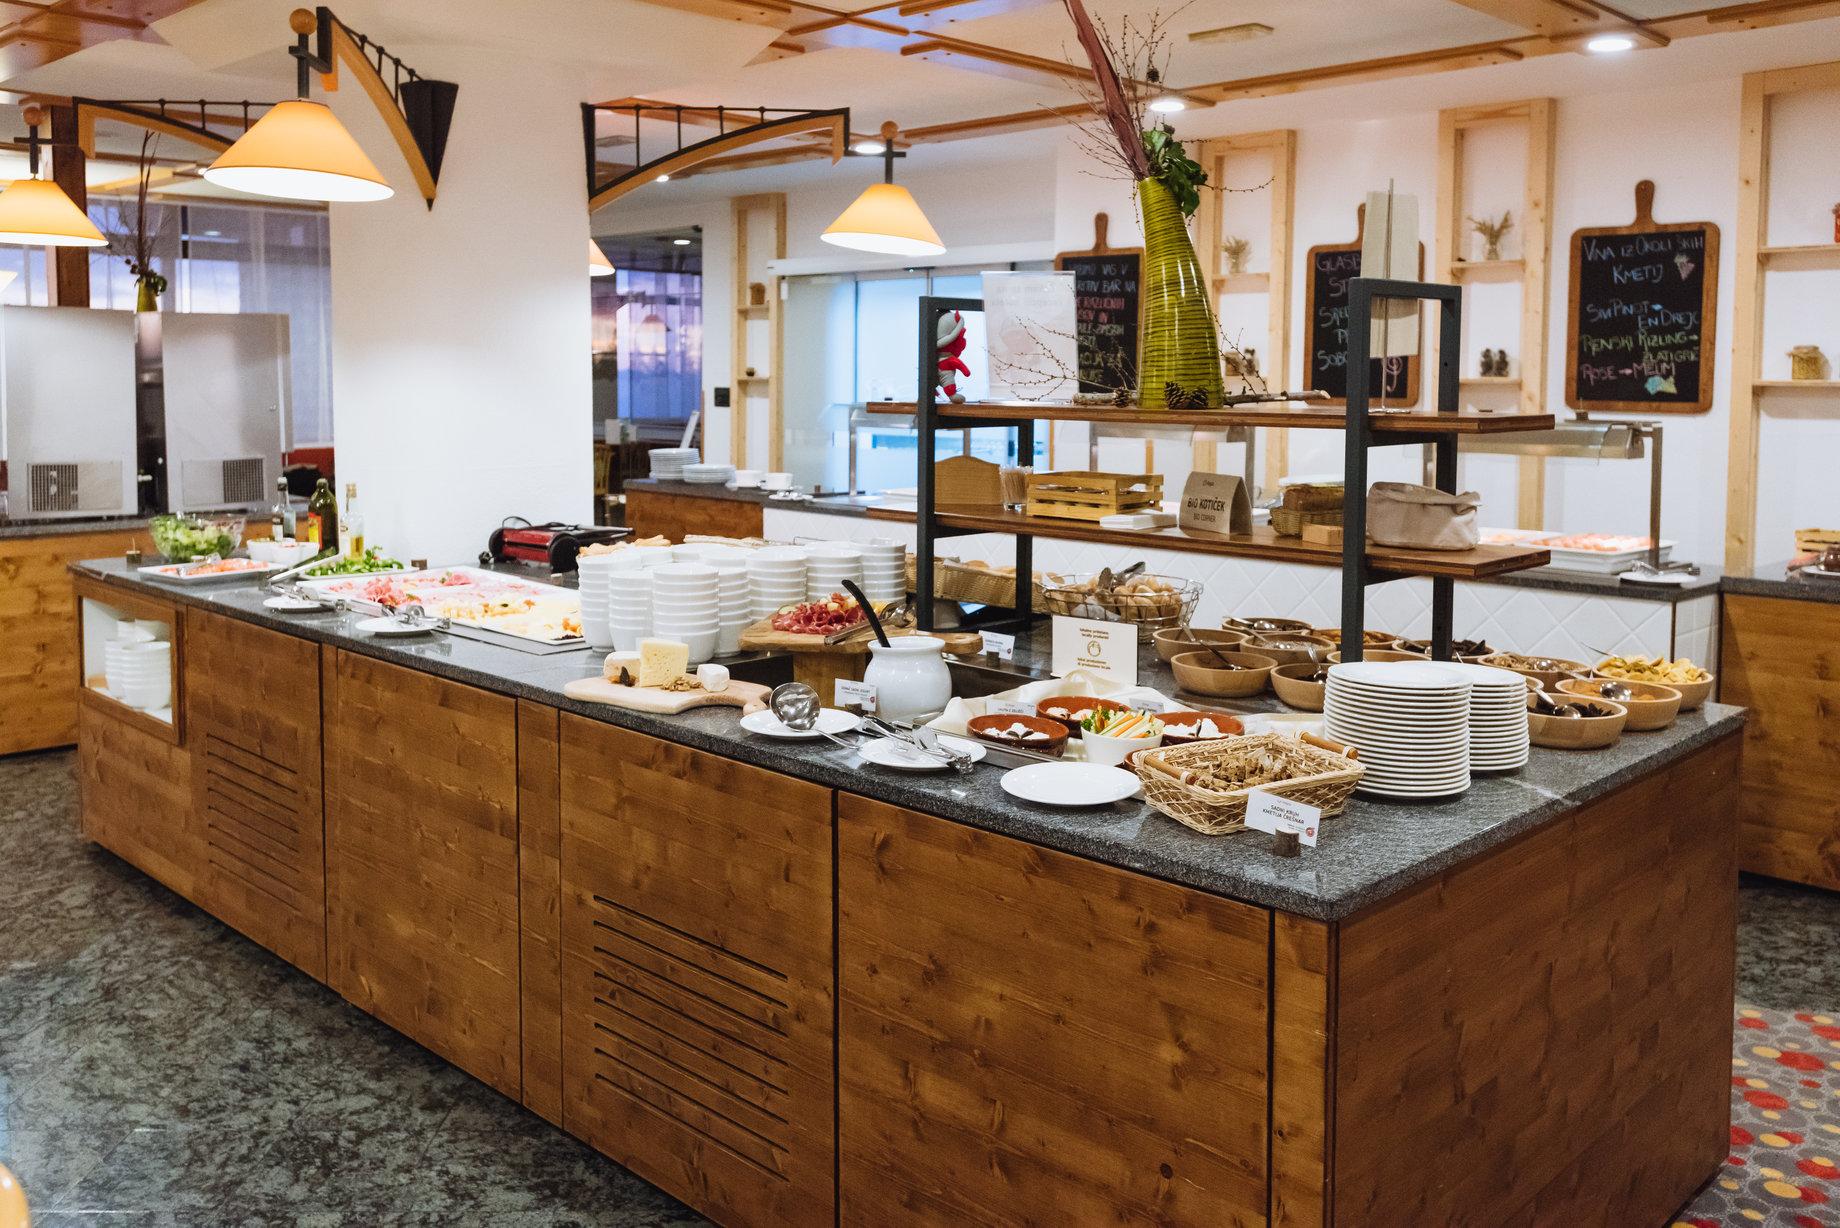 rsz_rogla-breakfast-rogla-hotel